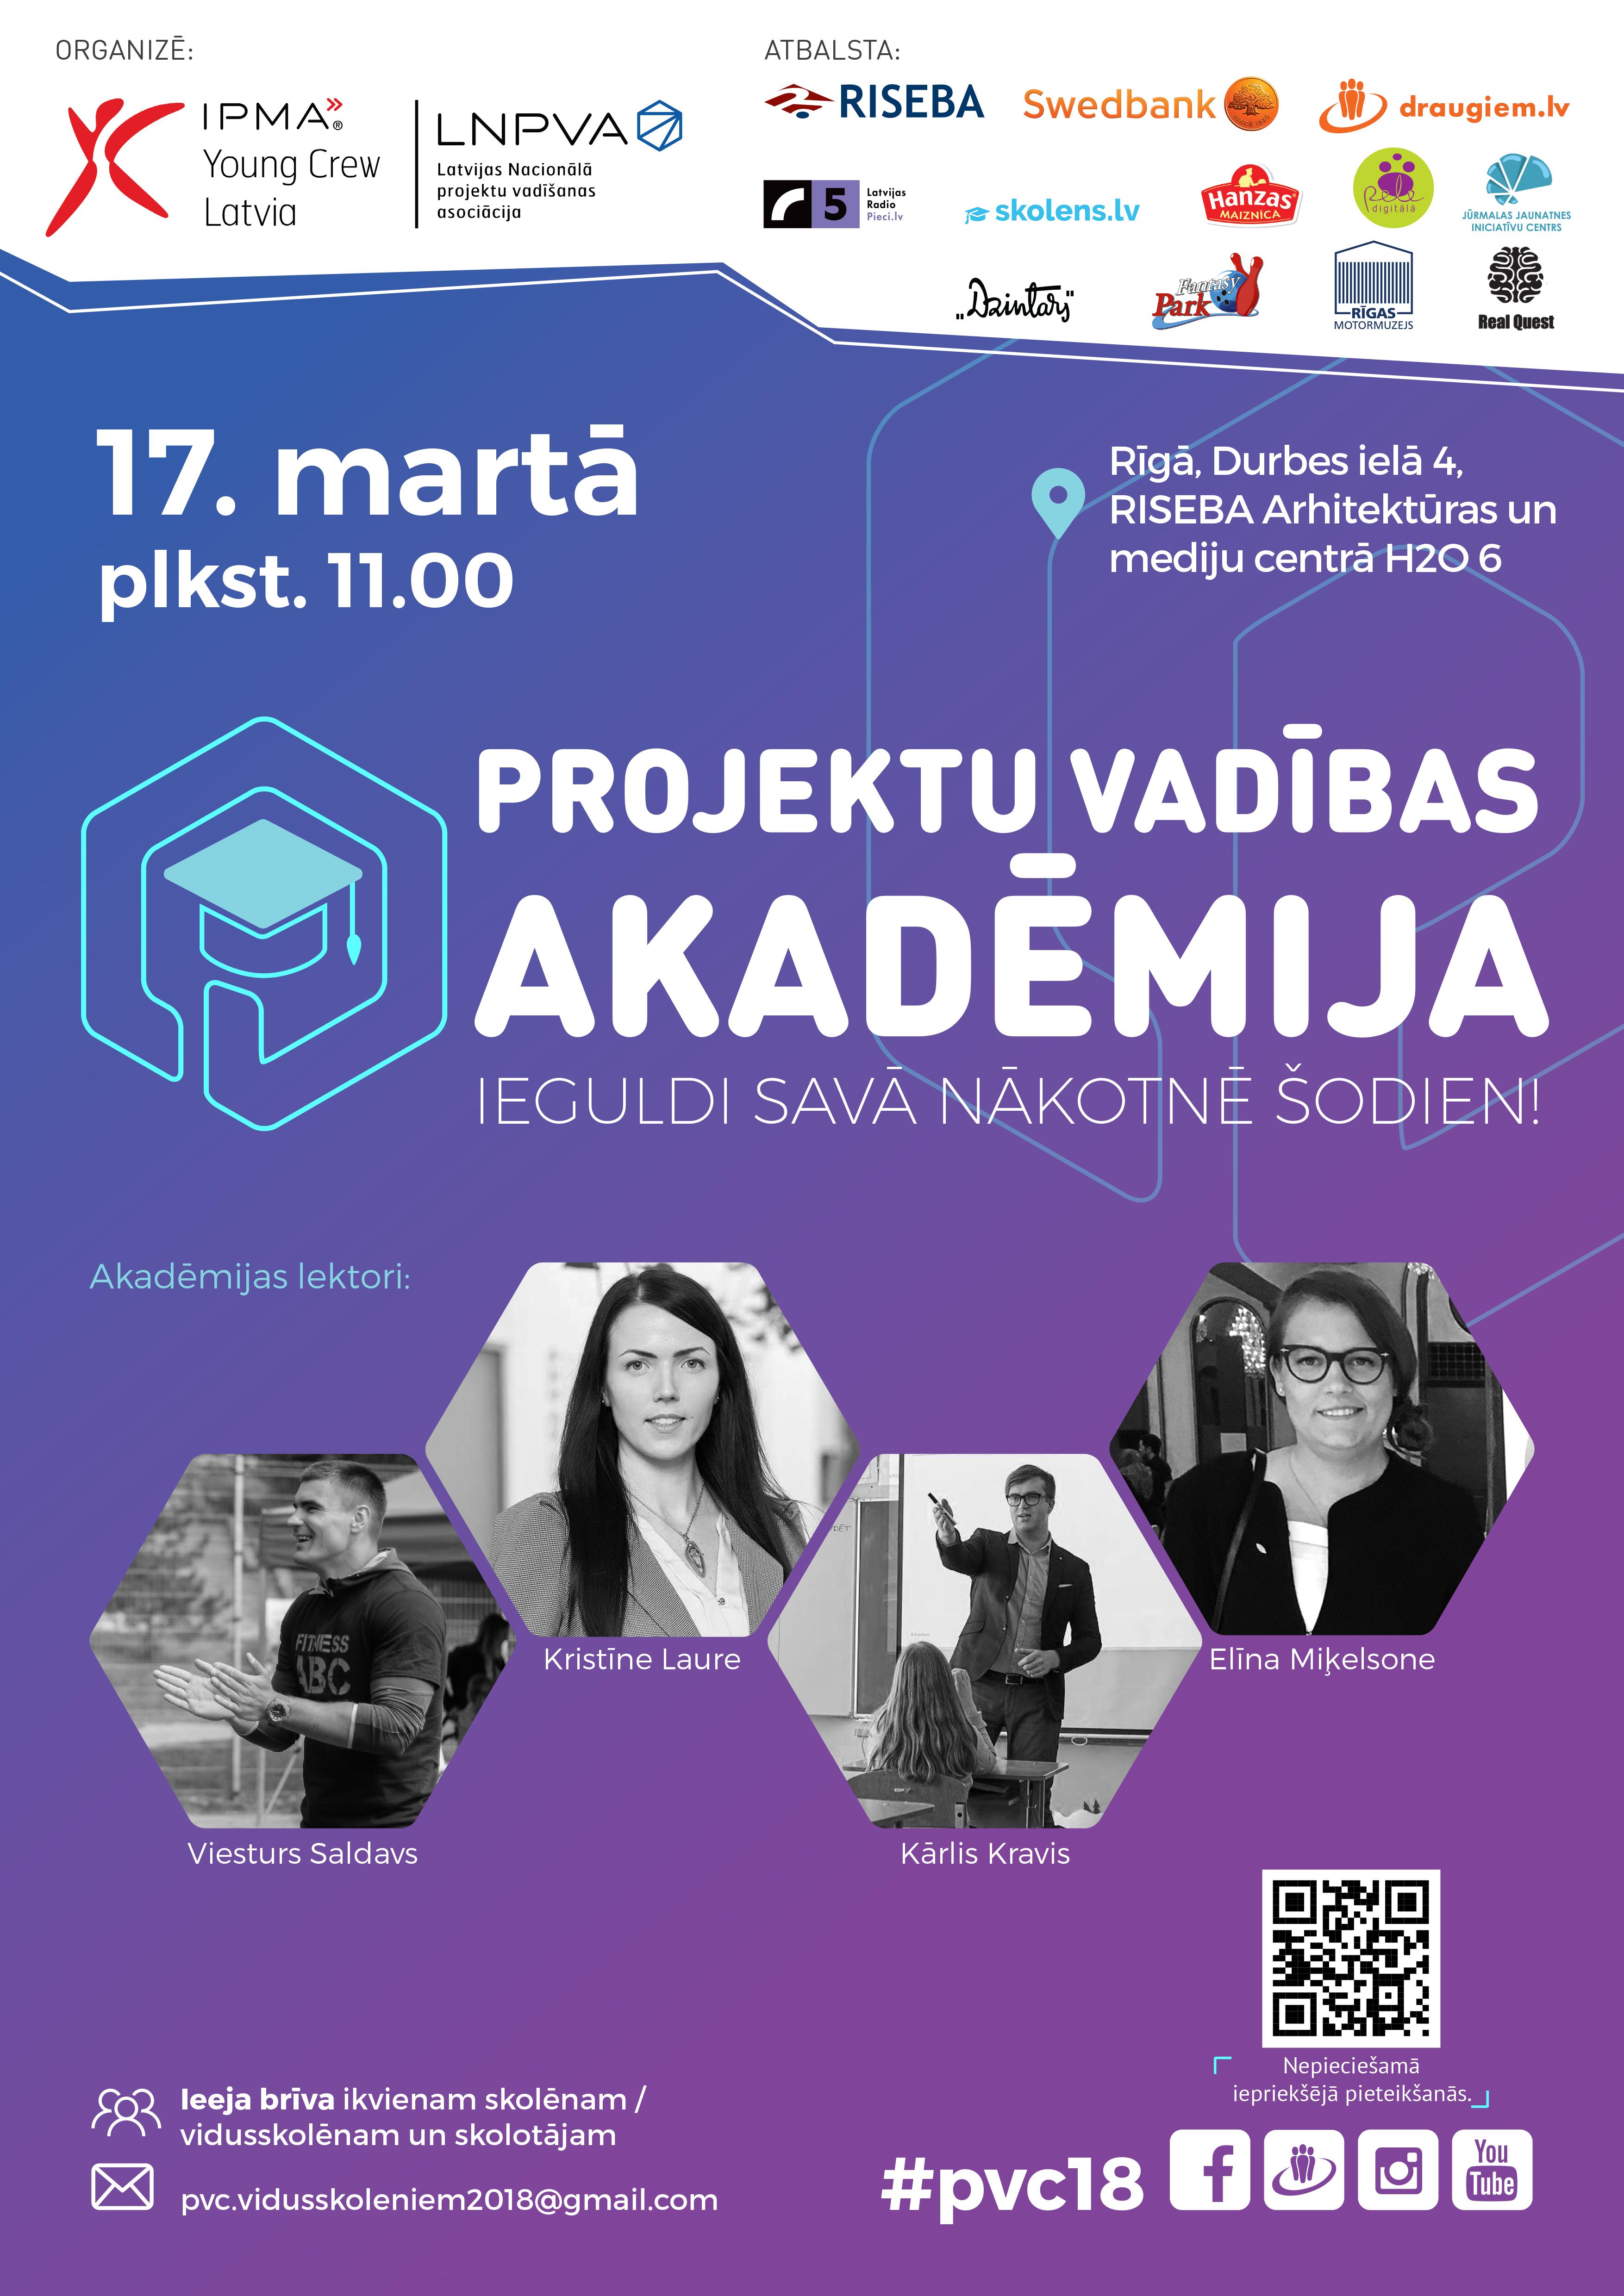 plakats-A3-pvc_akademijai-2018